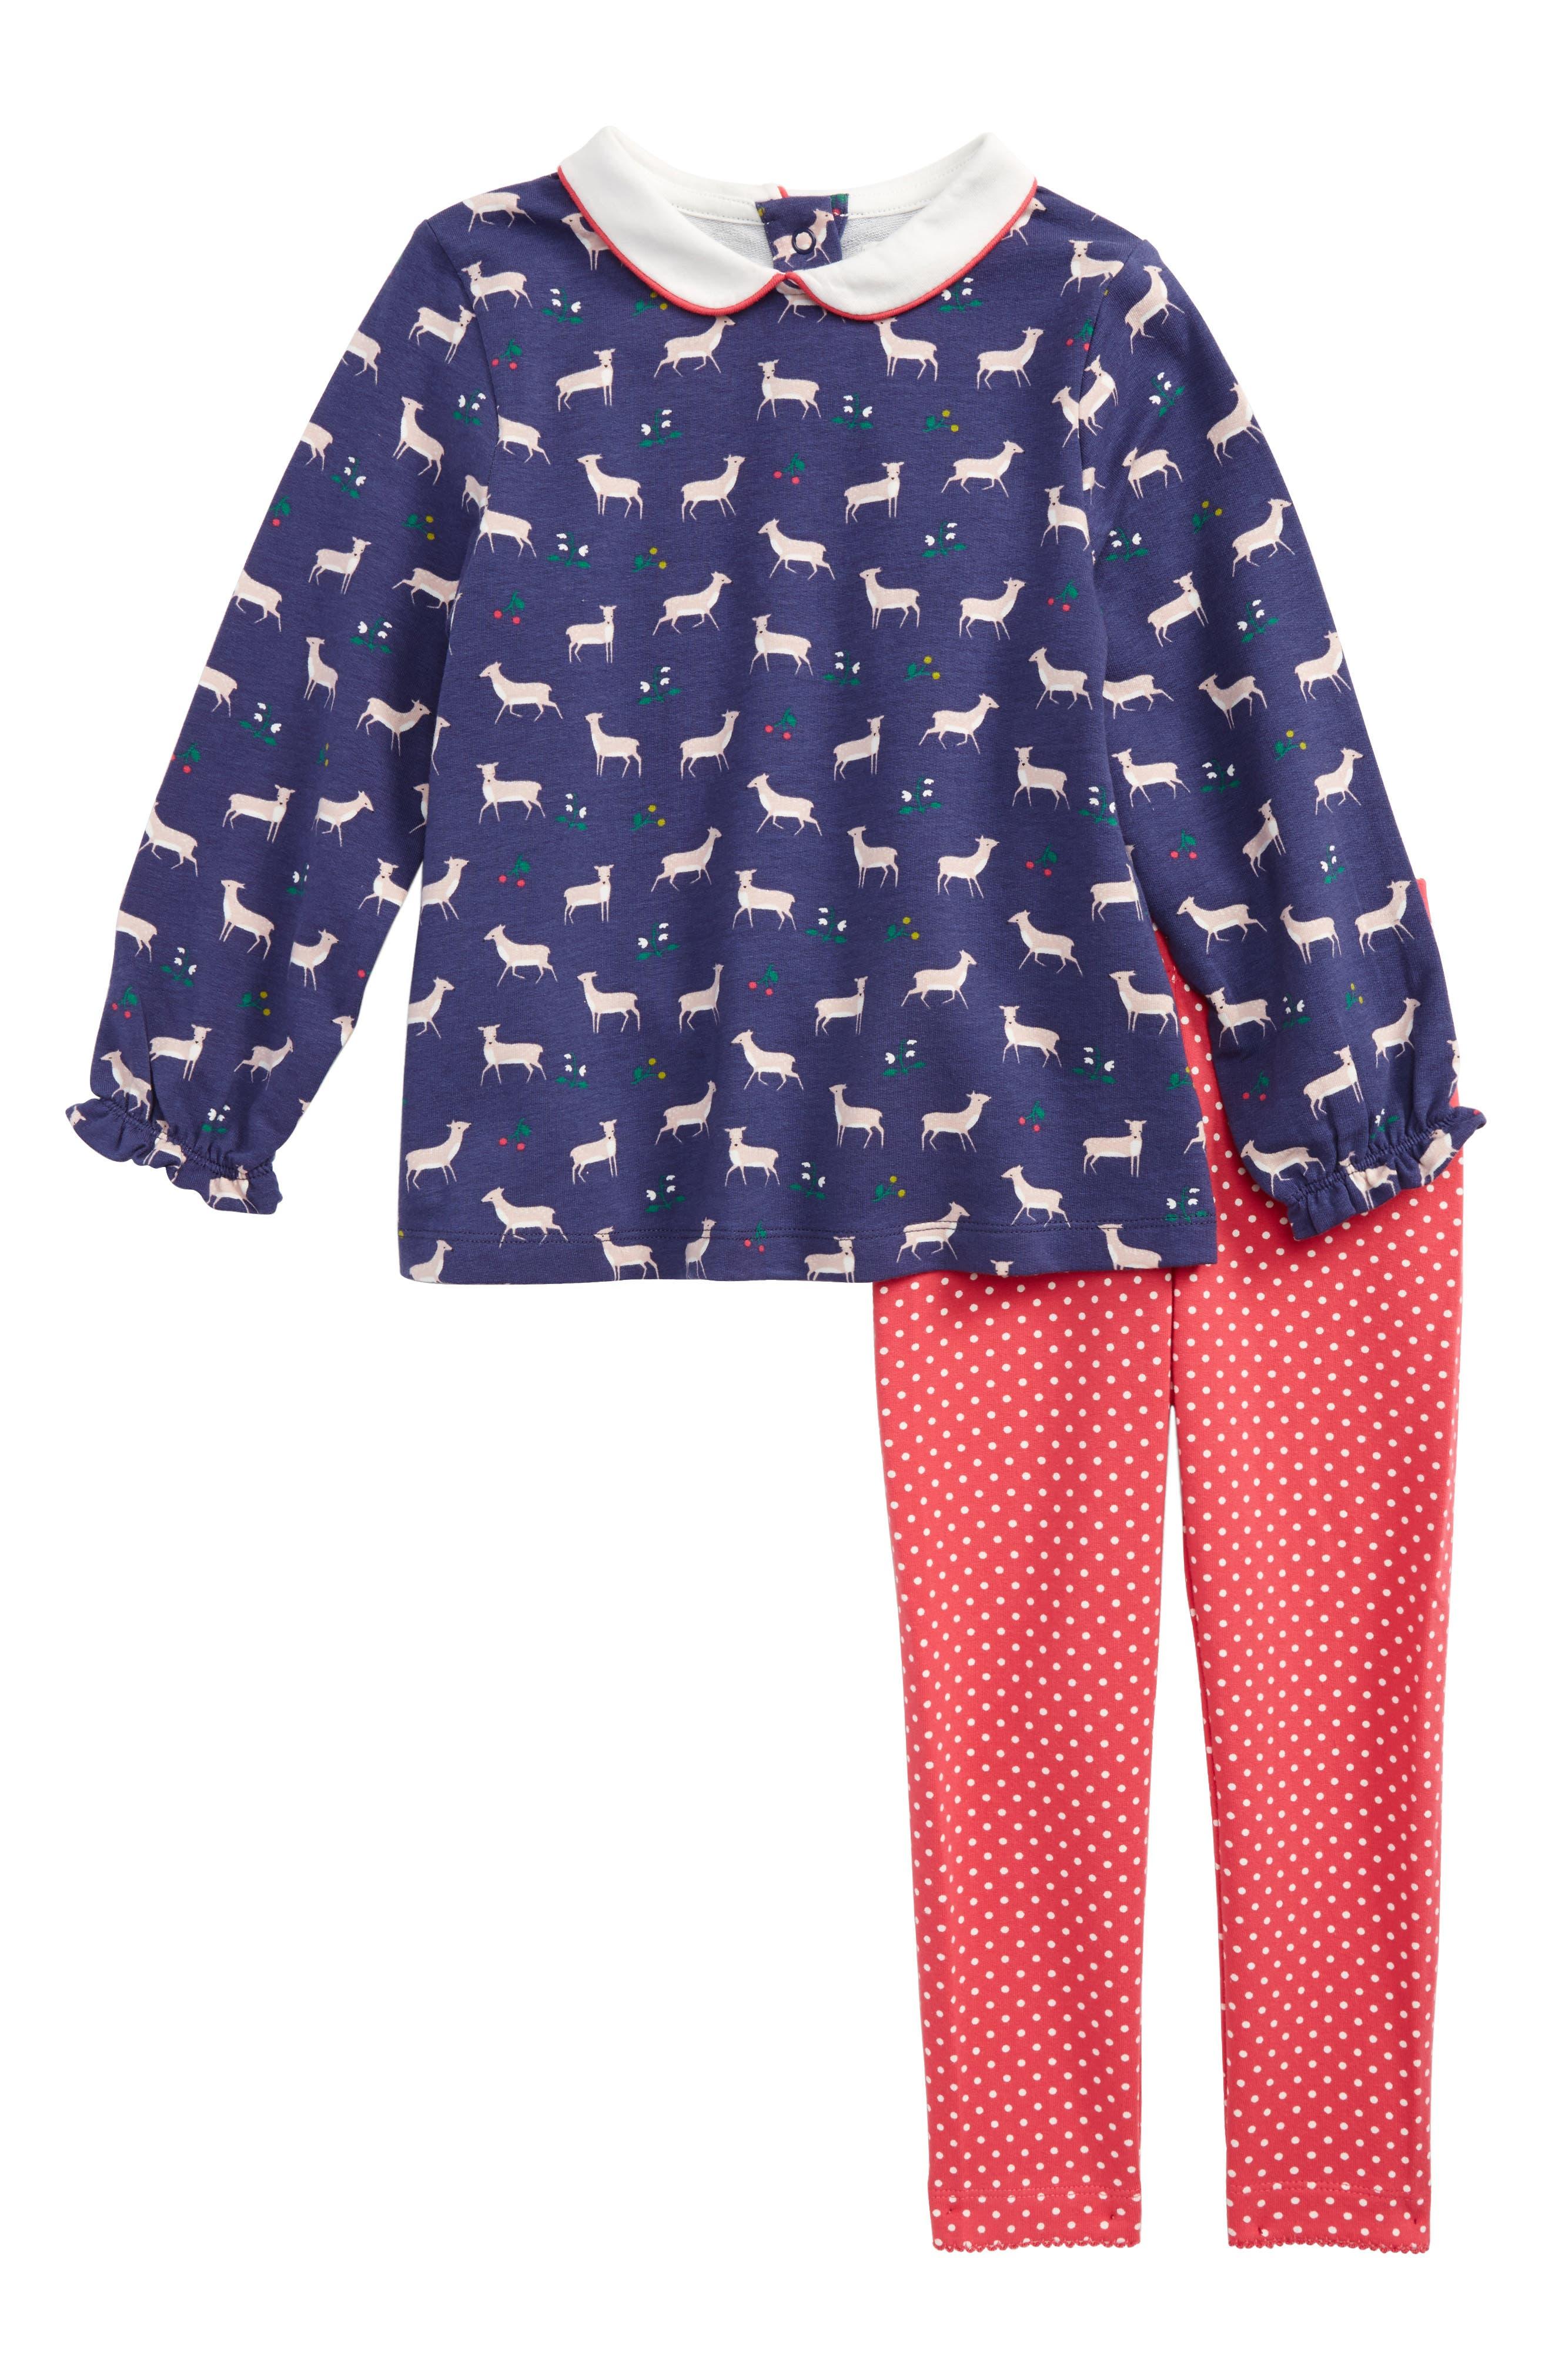 Main Image - Mini Boden Pretty Winter Tunic & Leggings Set (Baby Girls & Toddler Girls)